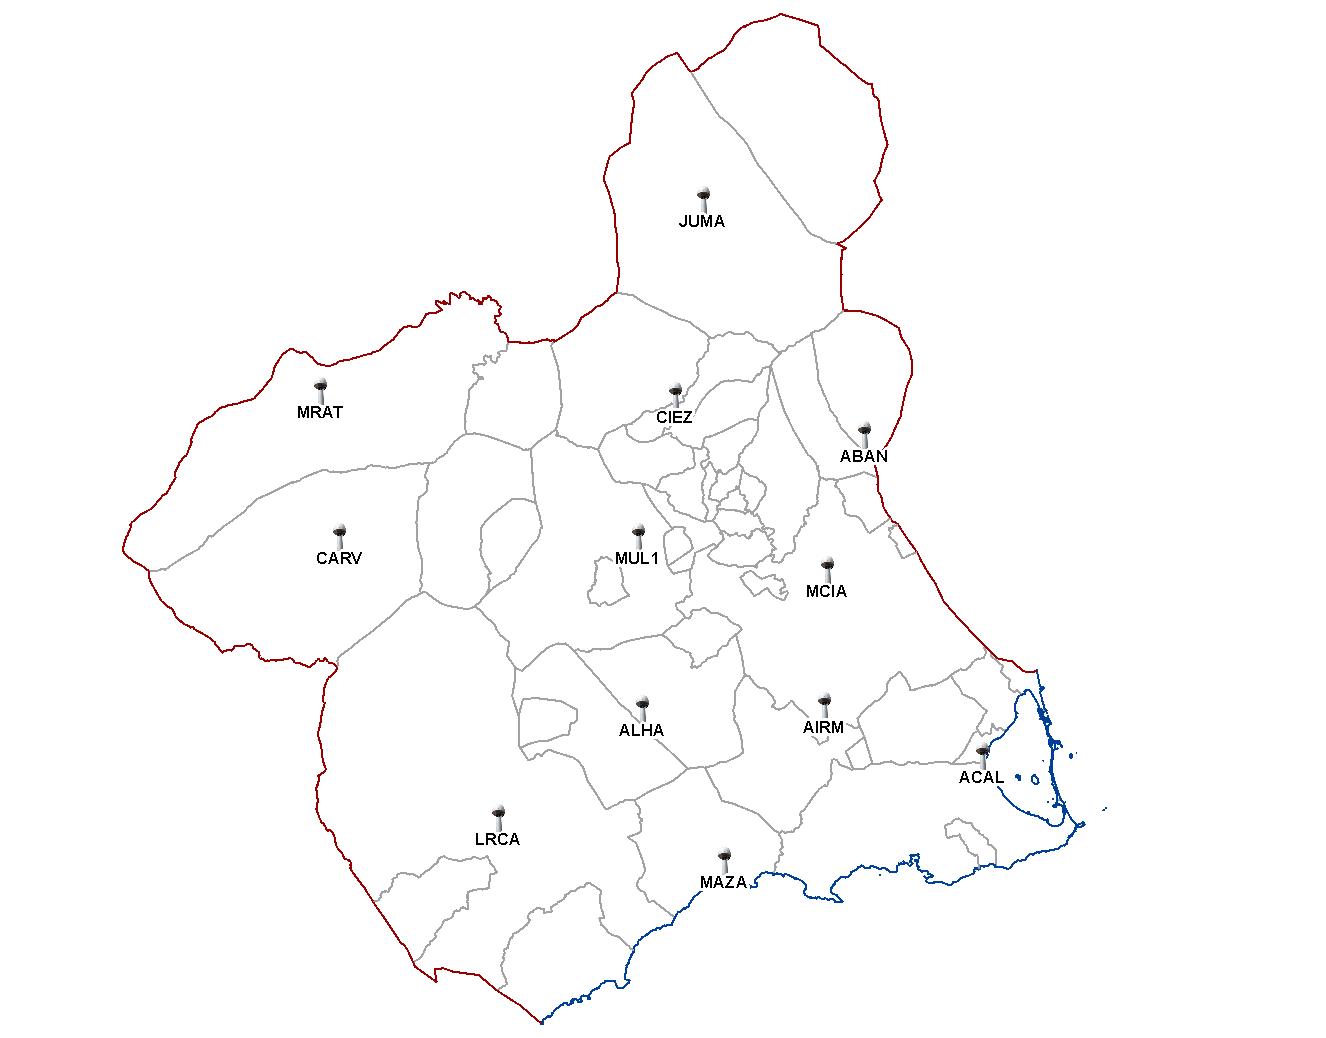 Mapa Region De Murcia.Mapa Region De Murcia Mapa